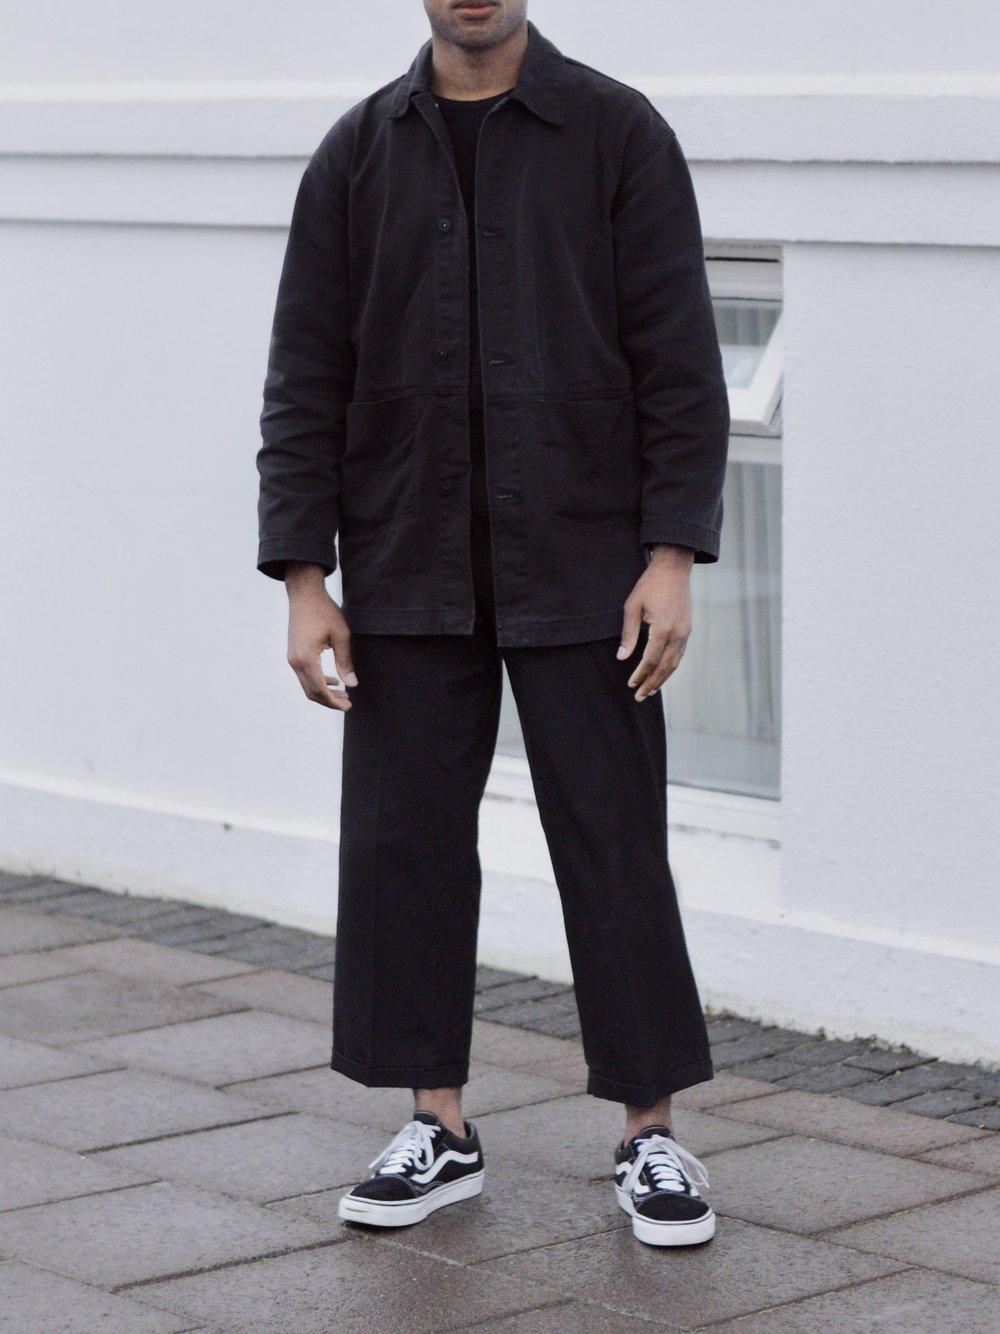 The-Look-Principle-Oversized-Worker-Style-In-Reykjavik-3.jpg